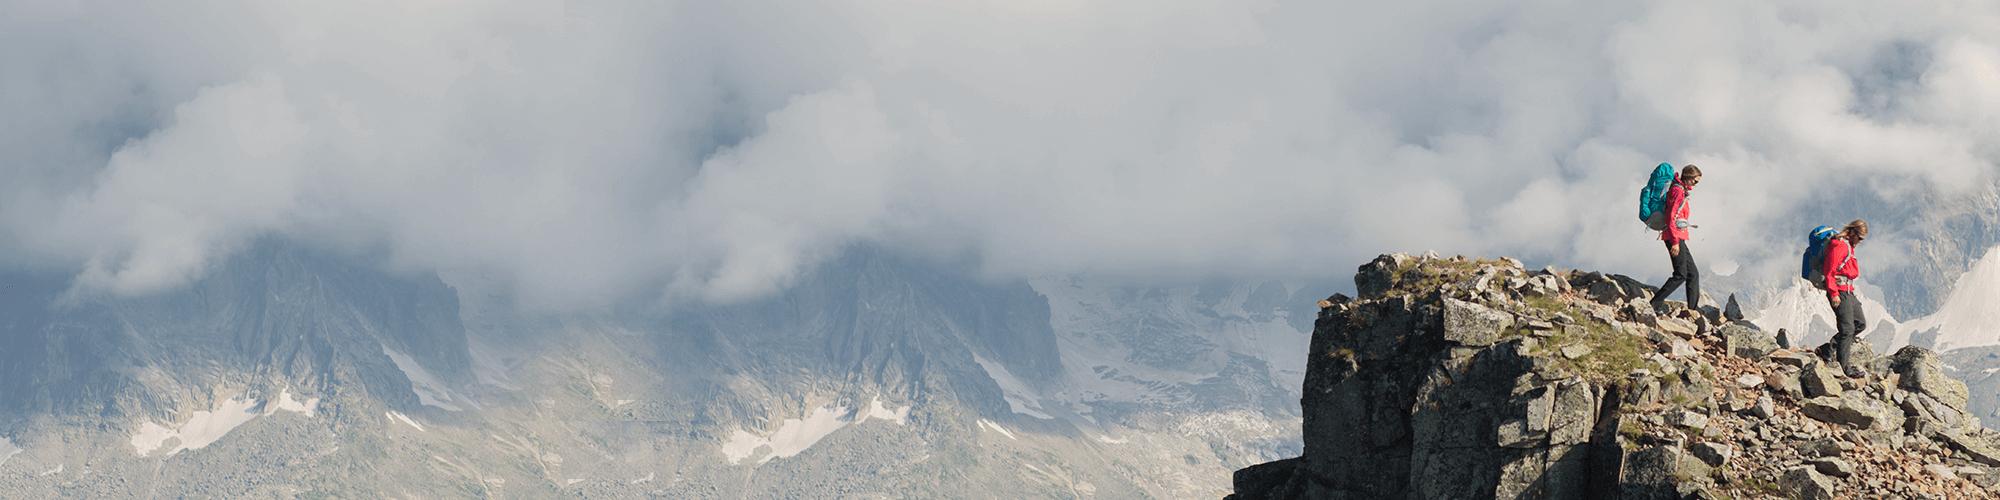 banner-categoria-trekking-hiking